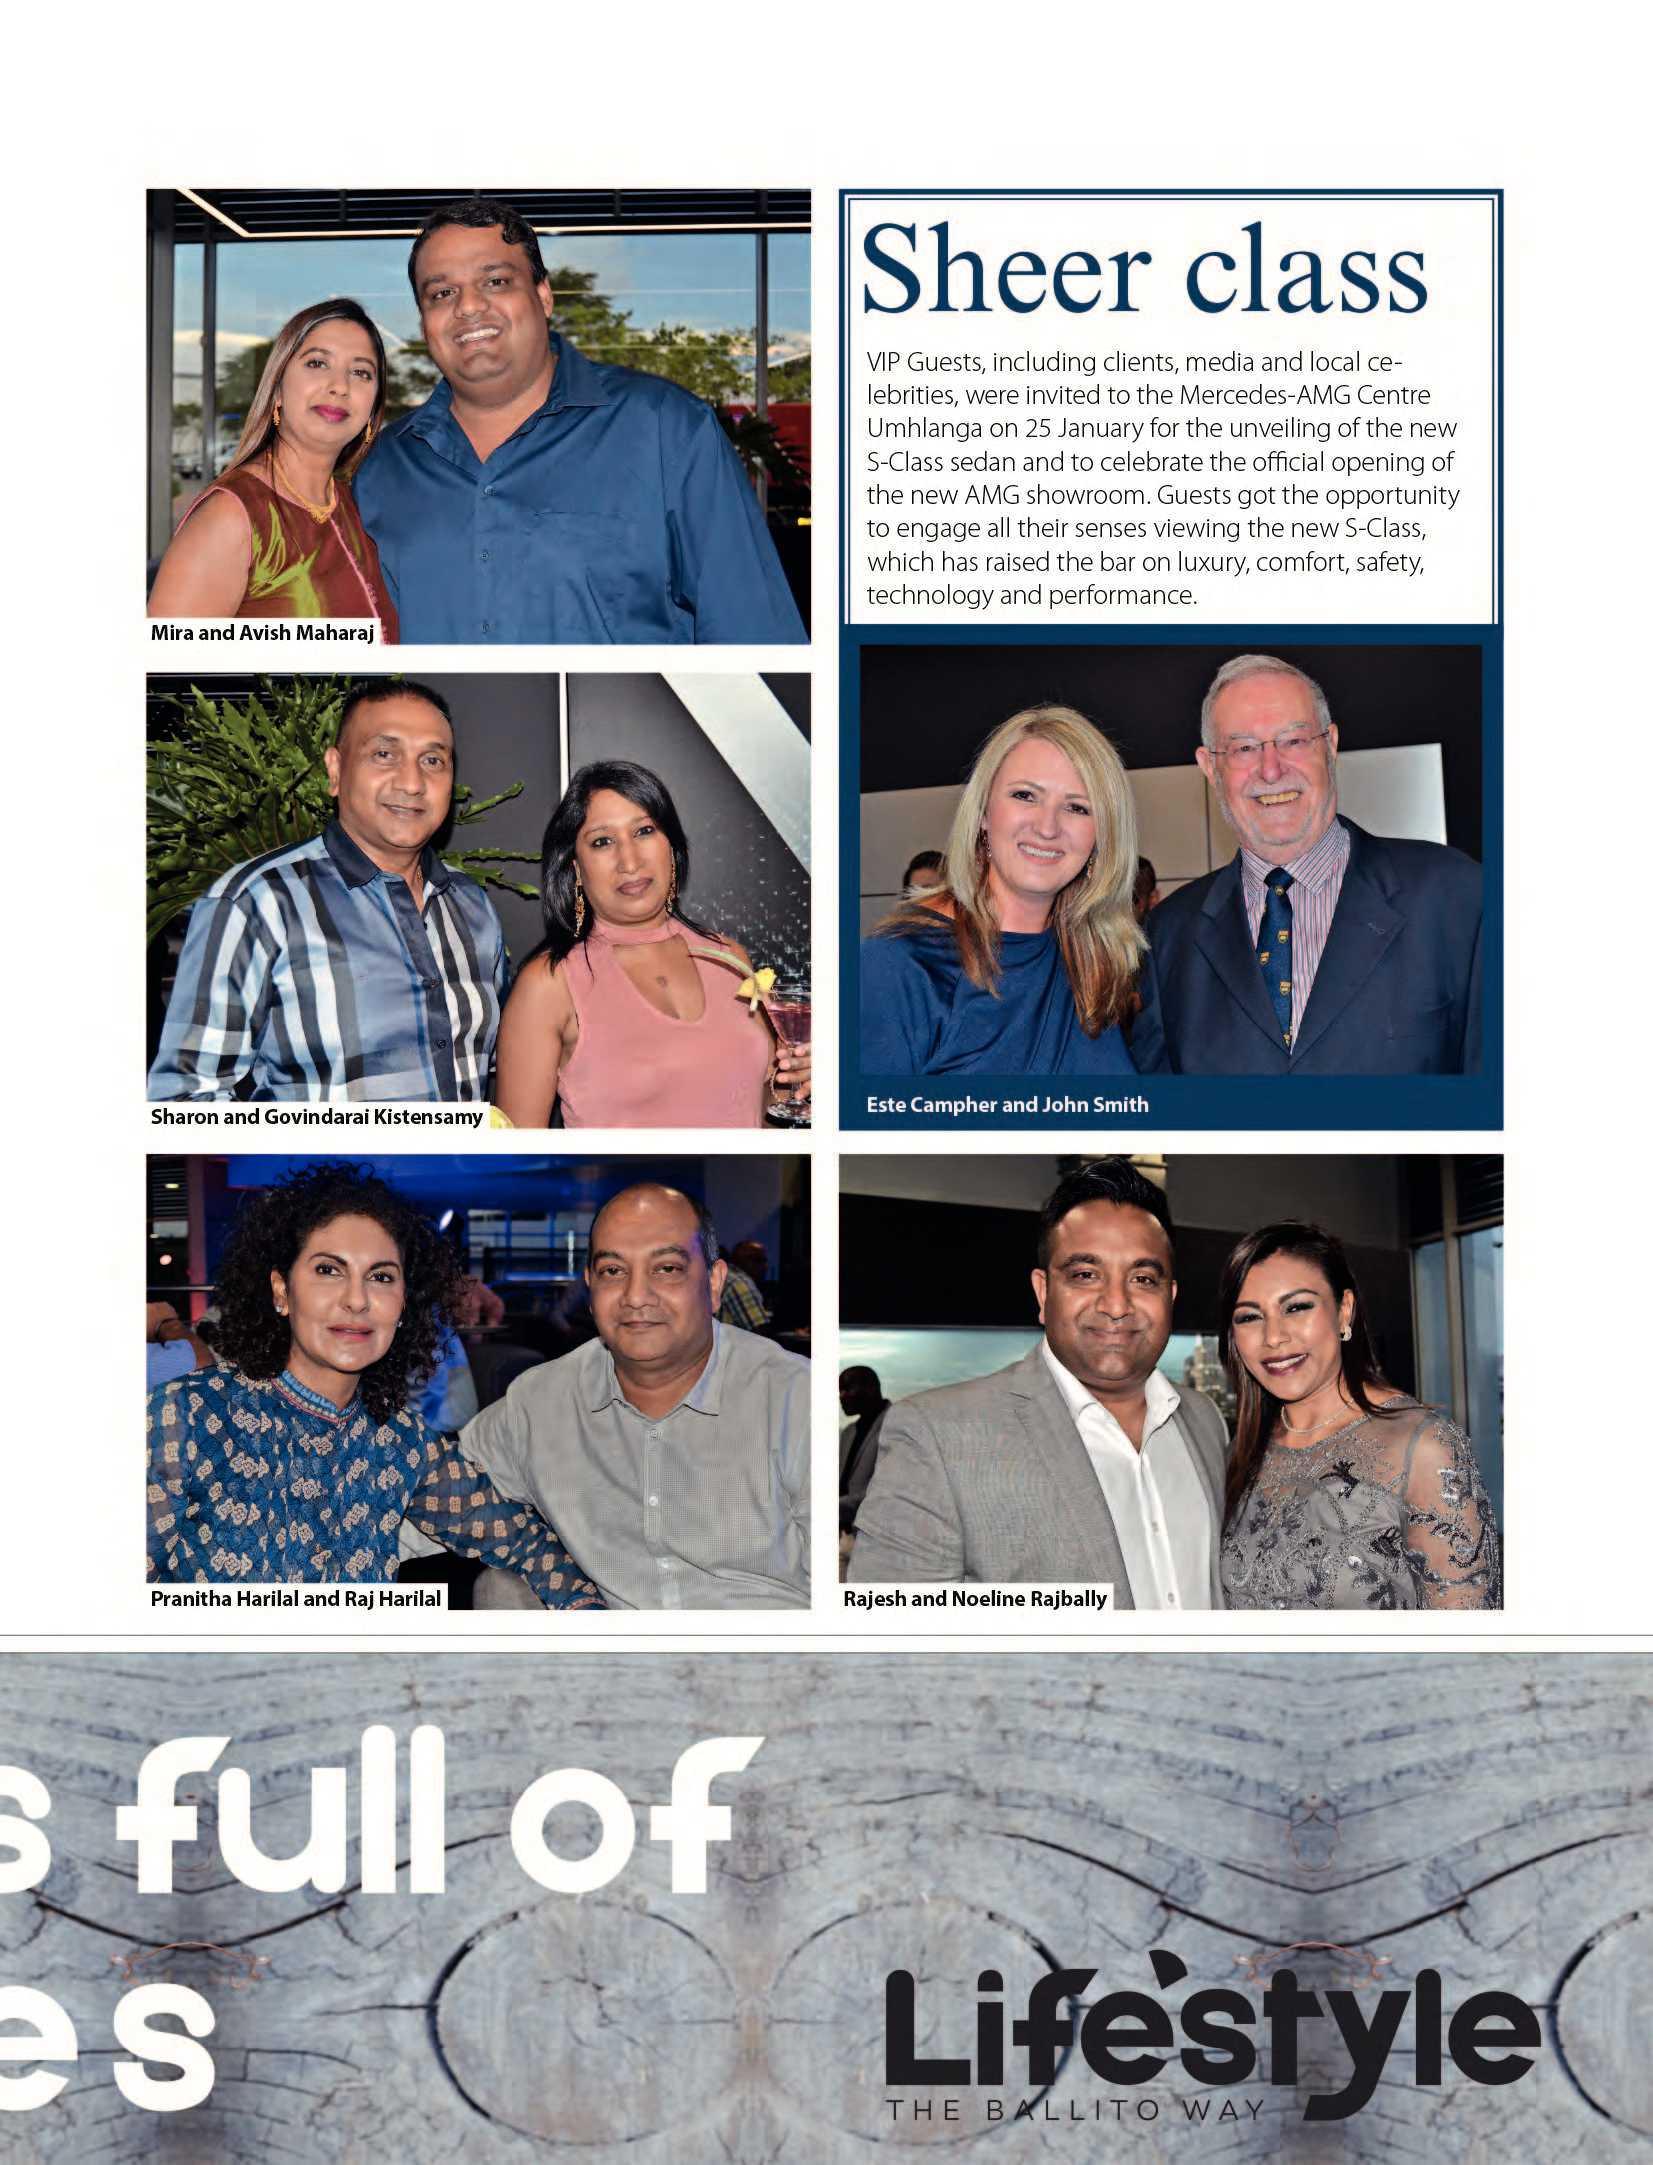 get-magazine-ballitoumhlanga-march-2018-epapers-page-13